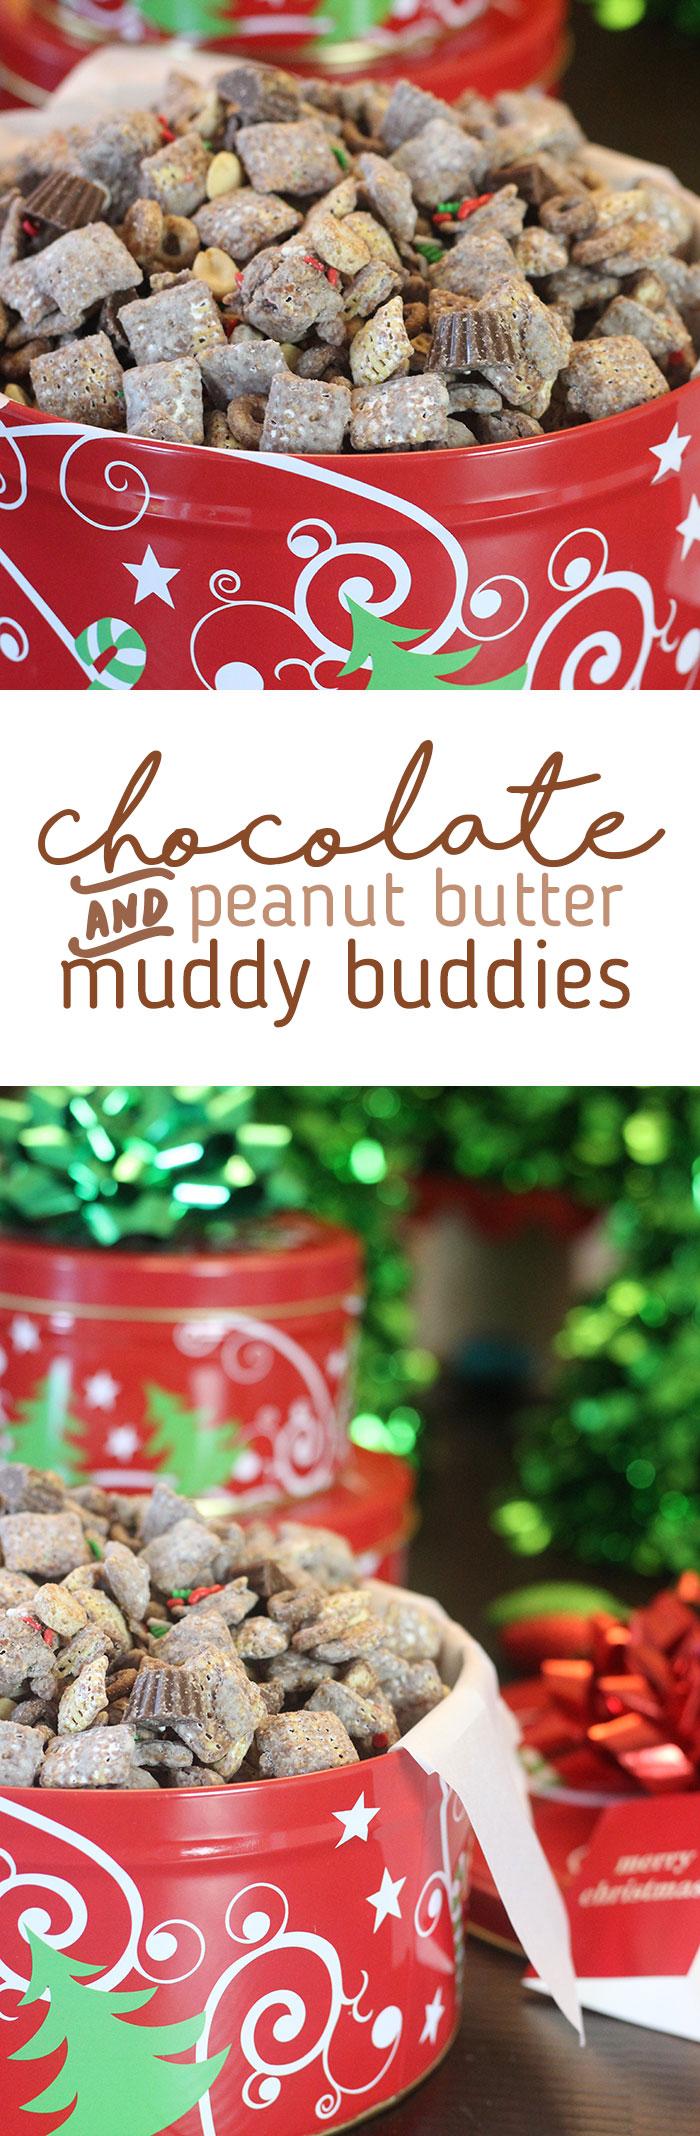 Peanut Butter and Chocolate Muddy Buddies